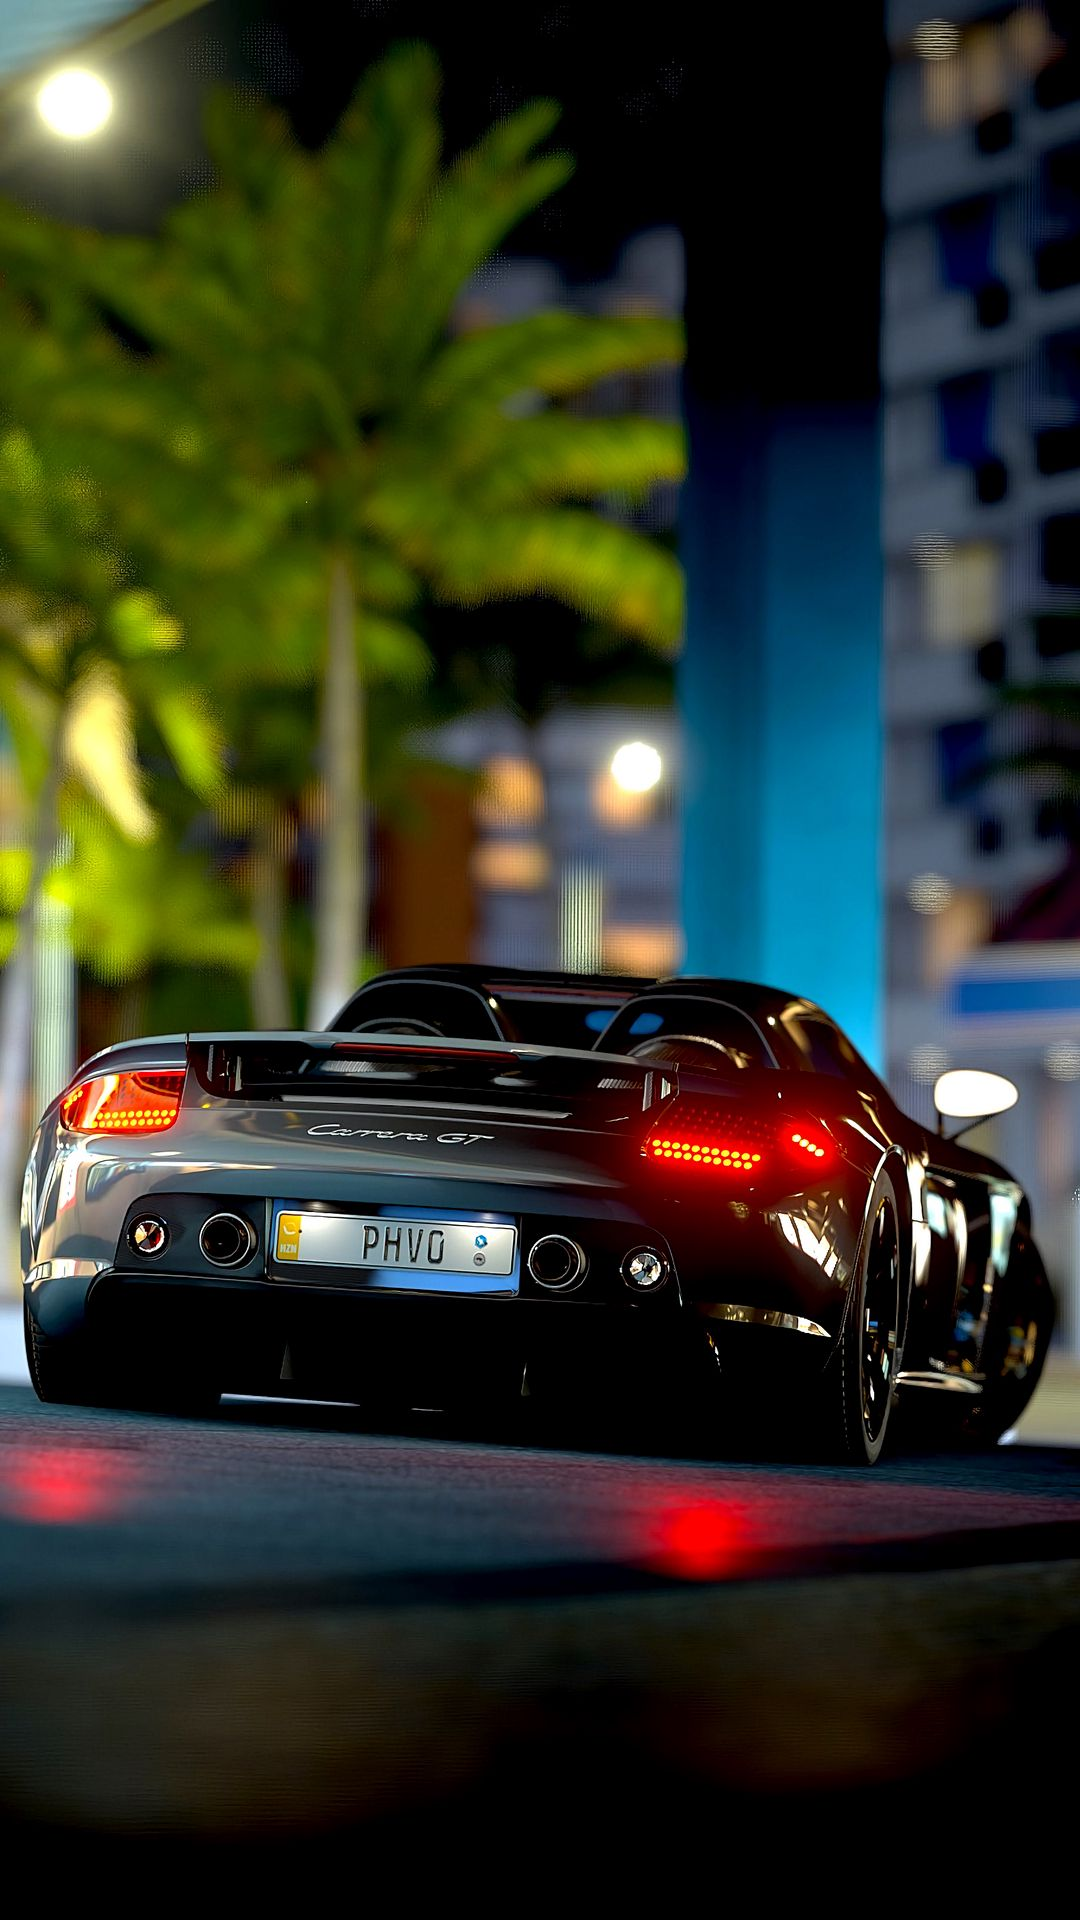 Porsche Carrera GT Series Wallpapers Free Download